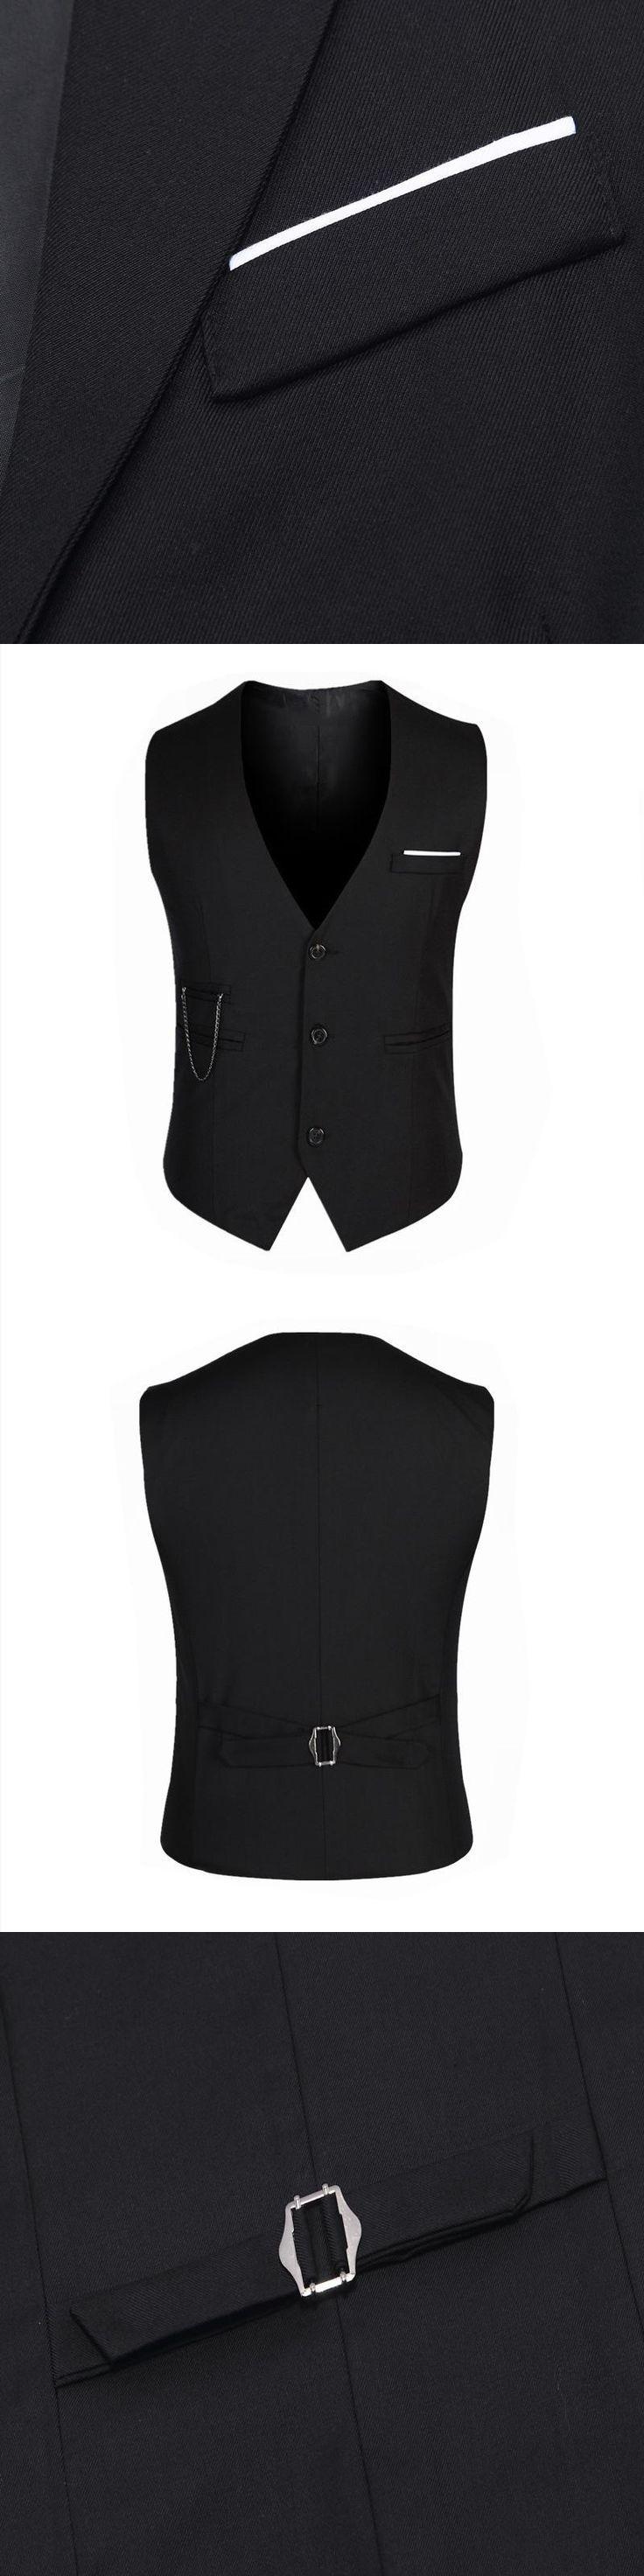 Men's Suit Vest Men gilet Solid White Grey Black Red Formal Dress Slim Fit Male Waistcoat Wedding Casual Blazer Vest Male